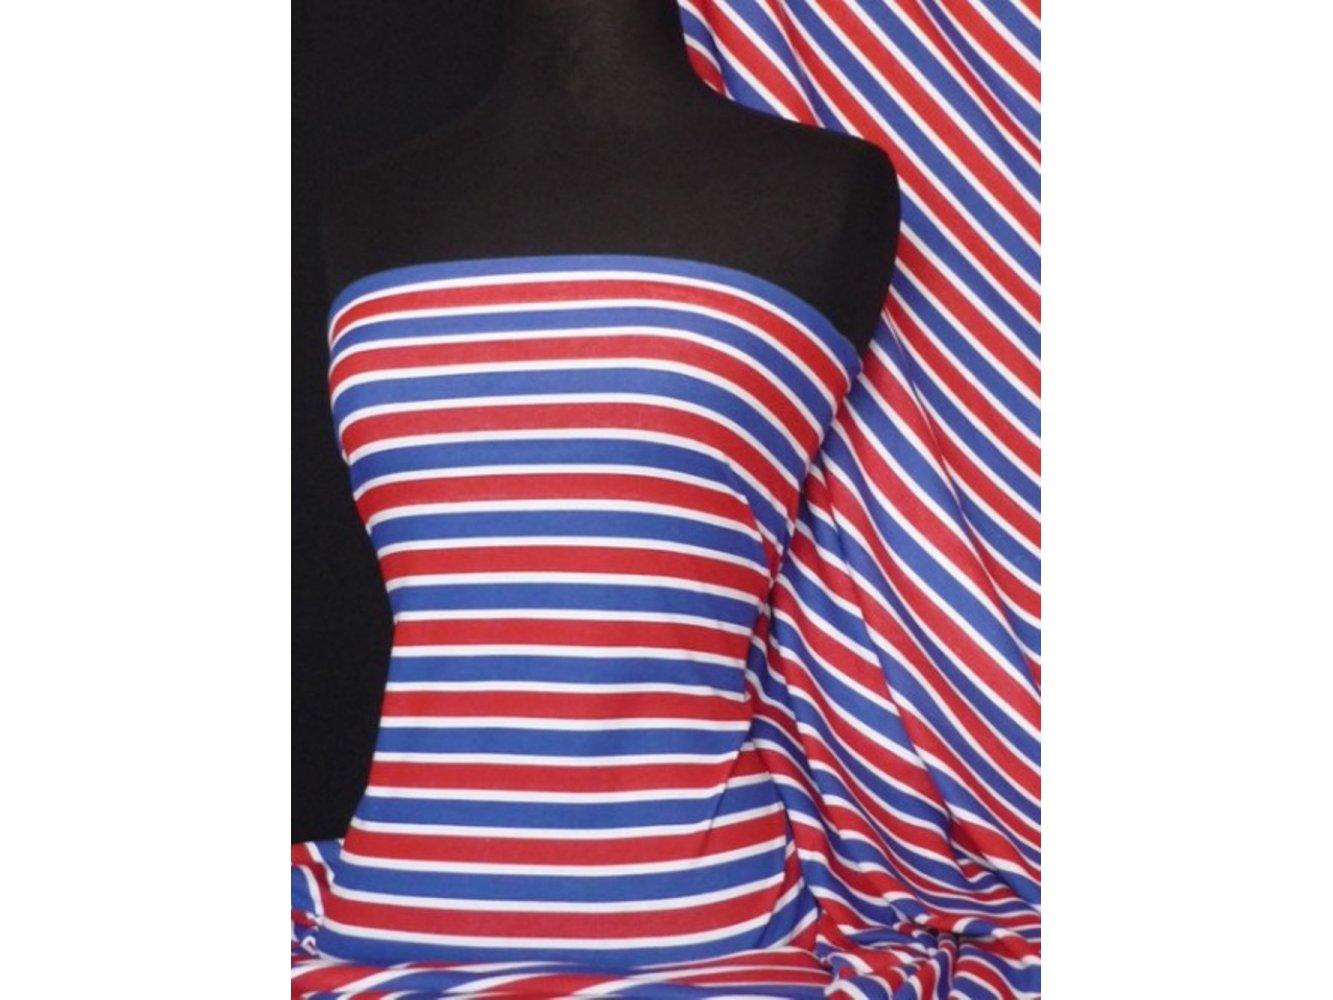 30424f53a4e 100% Cotton Interlock Knit Soft Jersey T-Shirt Fabric- Easy Horizontal  Stripe Q749. ‹